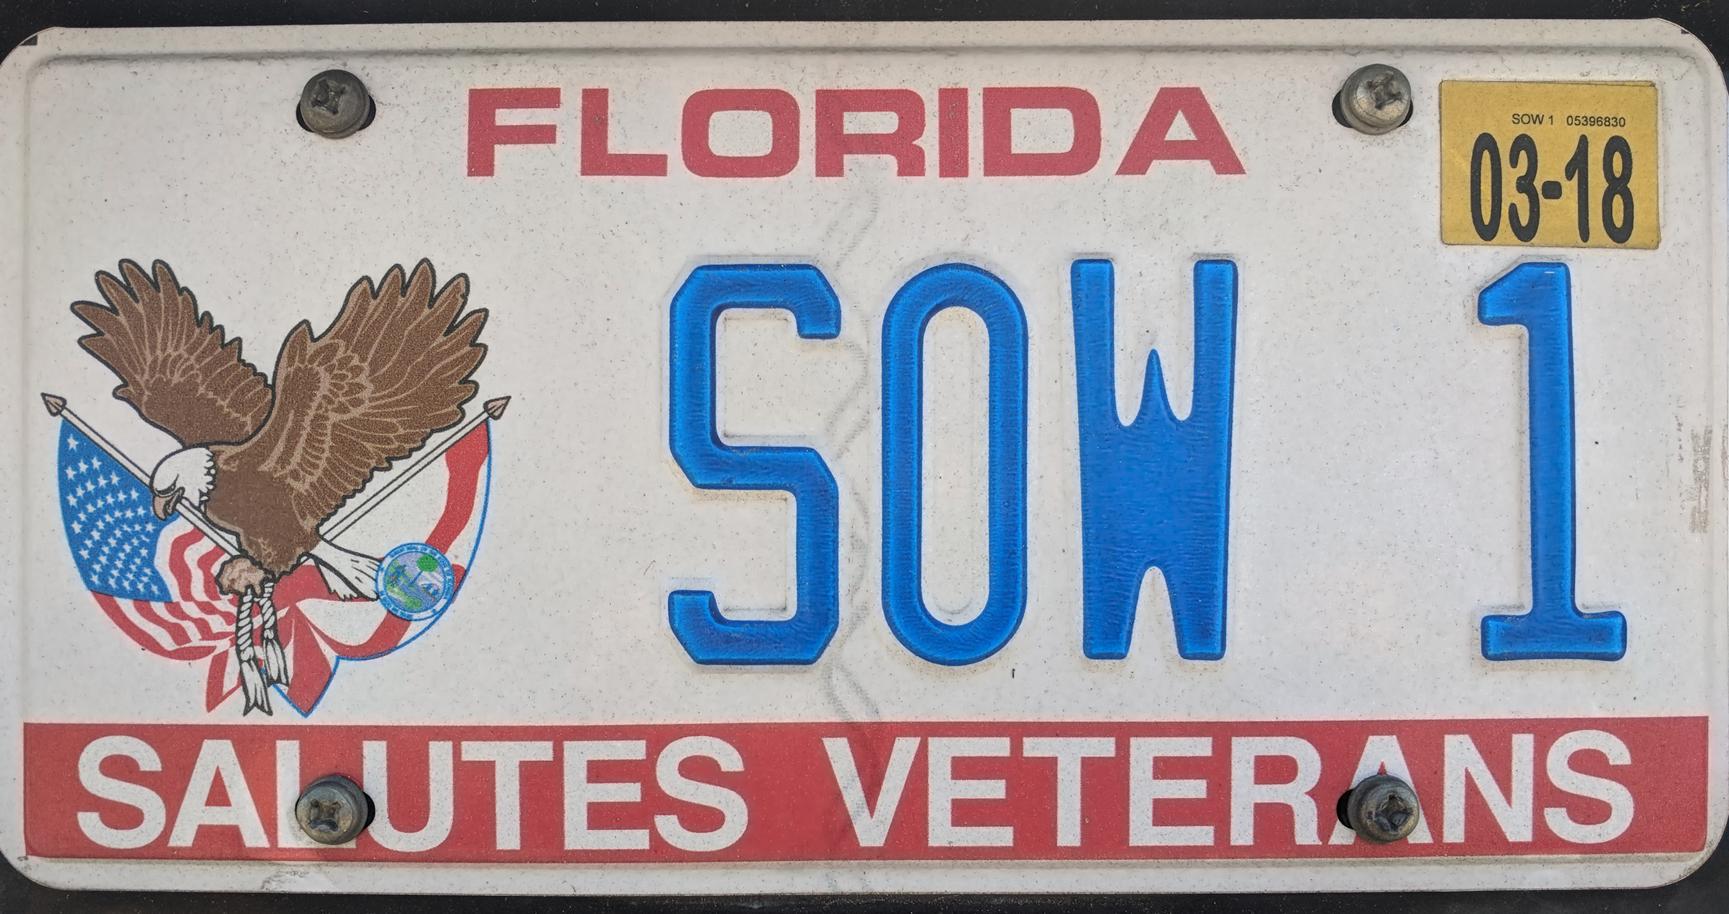 Florida salutes veterans Florida vehicle-registration plate